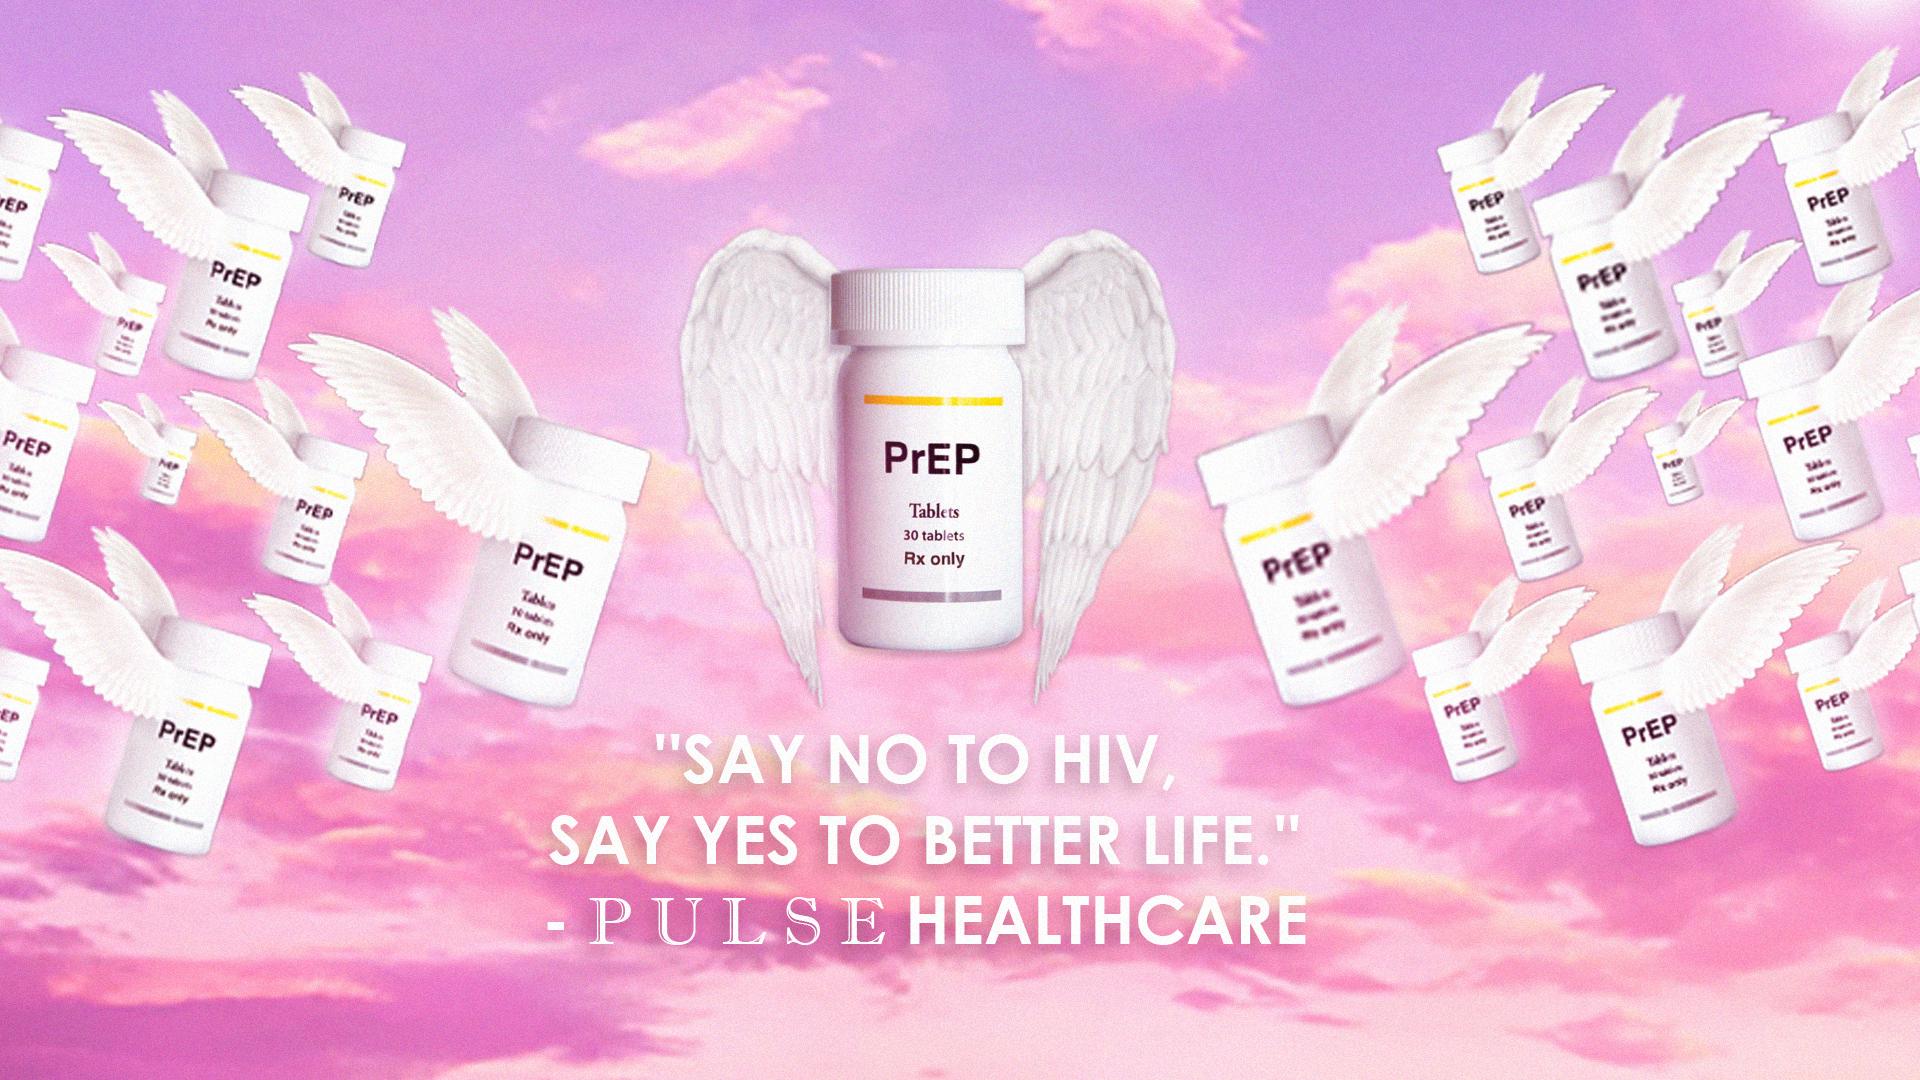 Buy PrEP Online